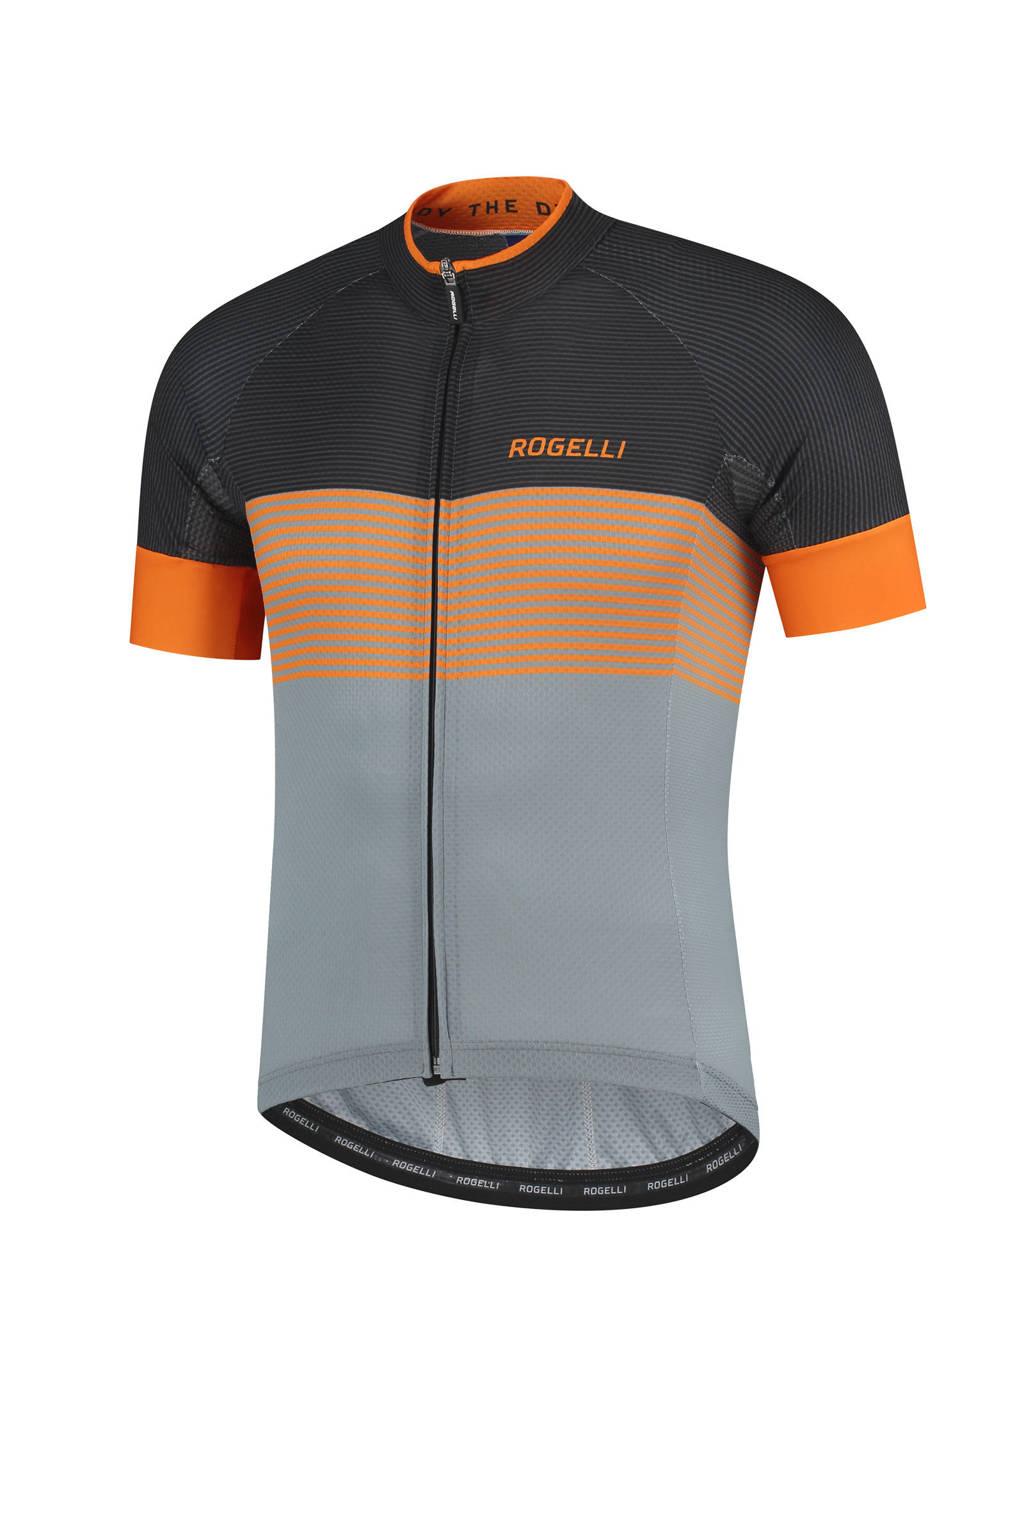 Rogelli   fietsshirt Boost grijs/oranje/zwart, Grijs/oranje/zwart